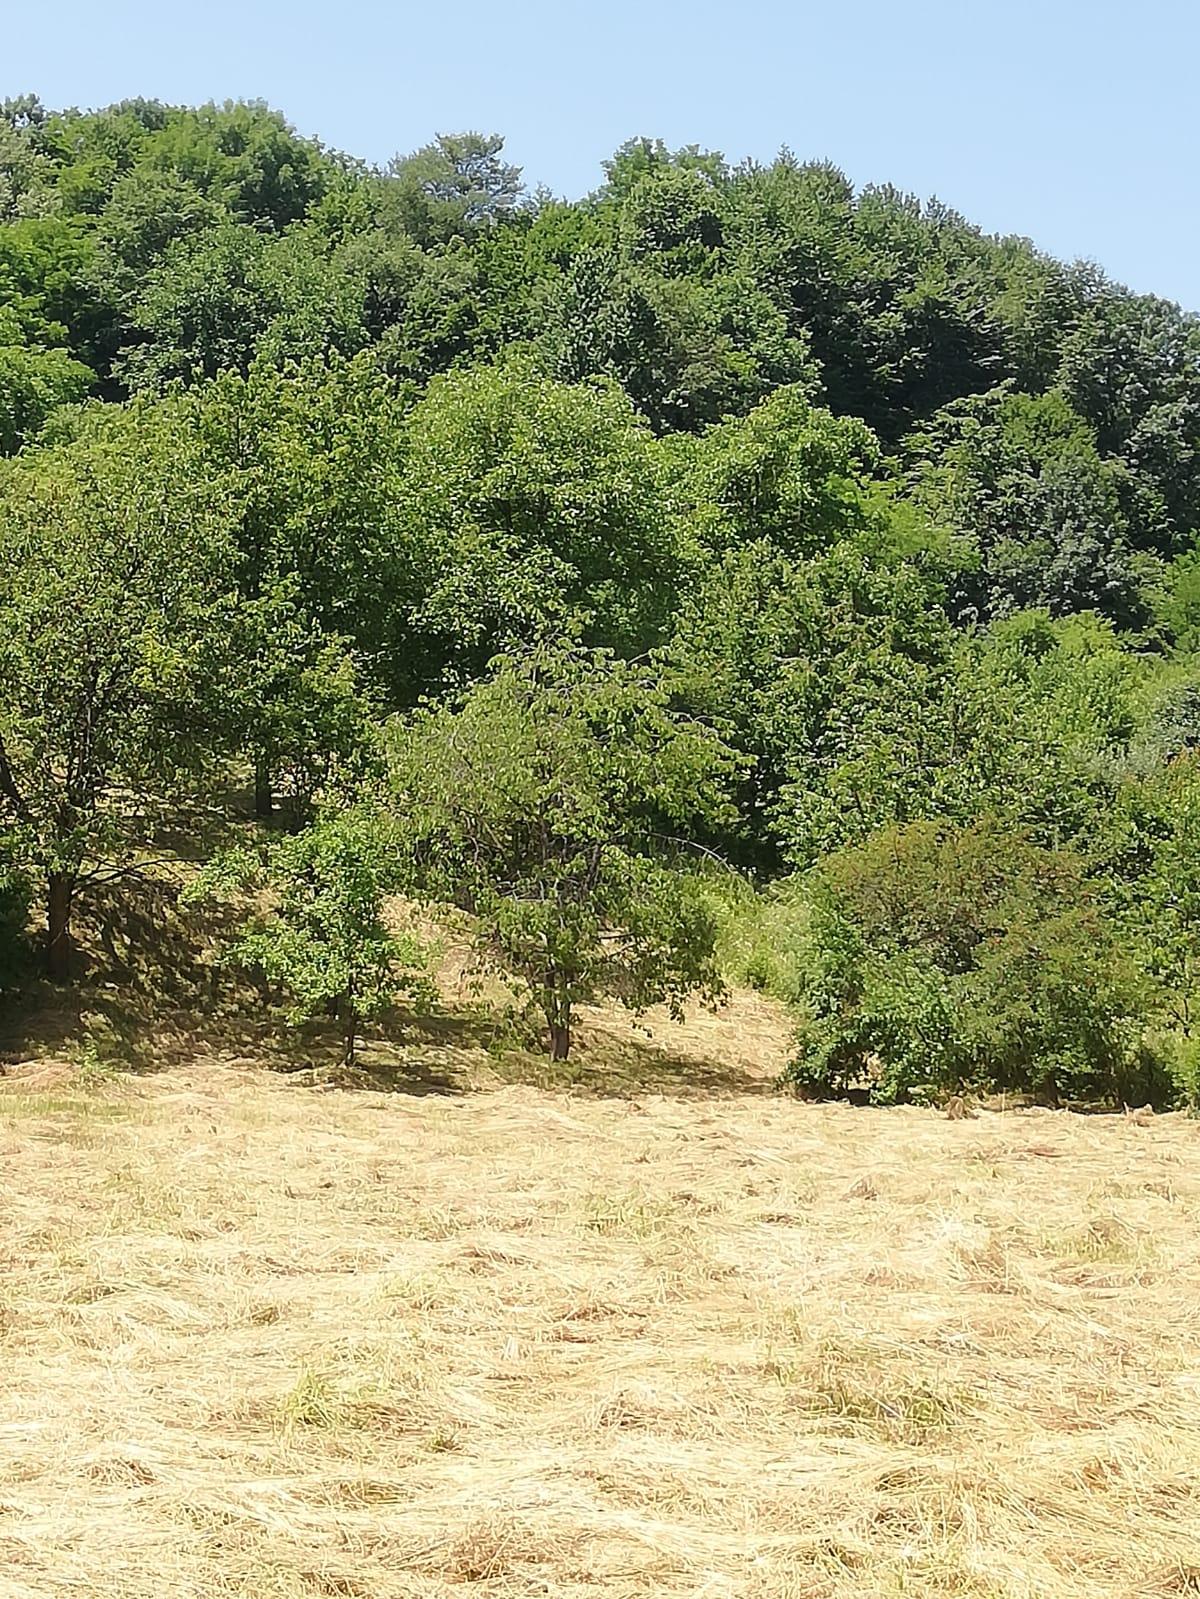 Vanzare teren intravilan Tatarani Dambovita